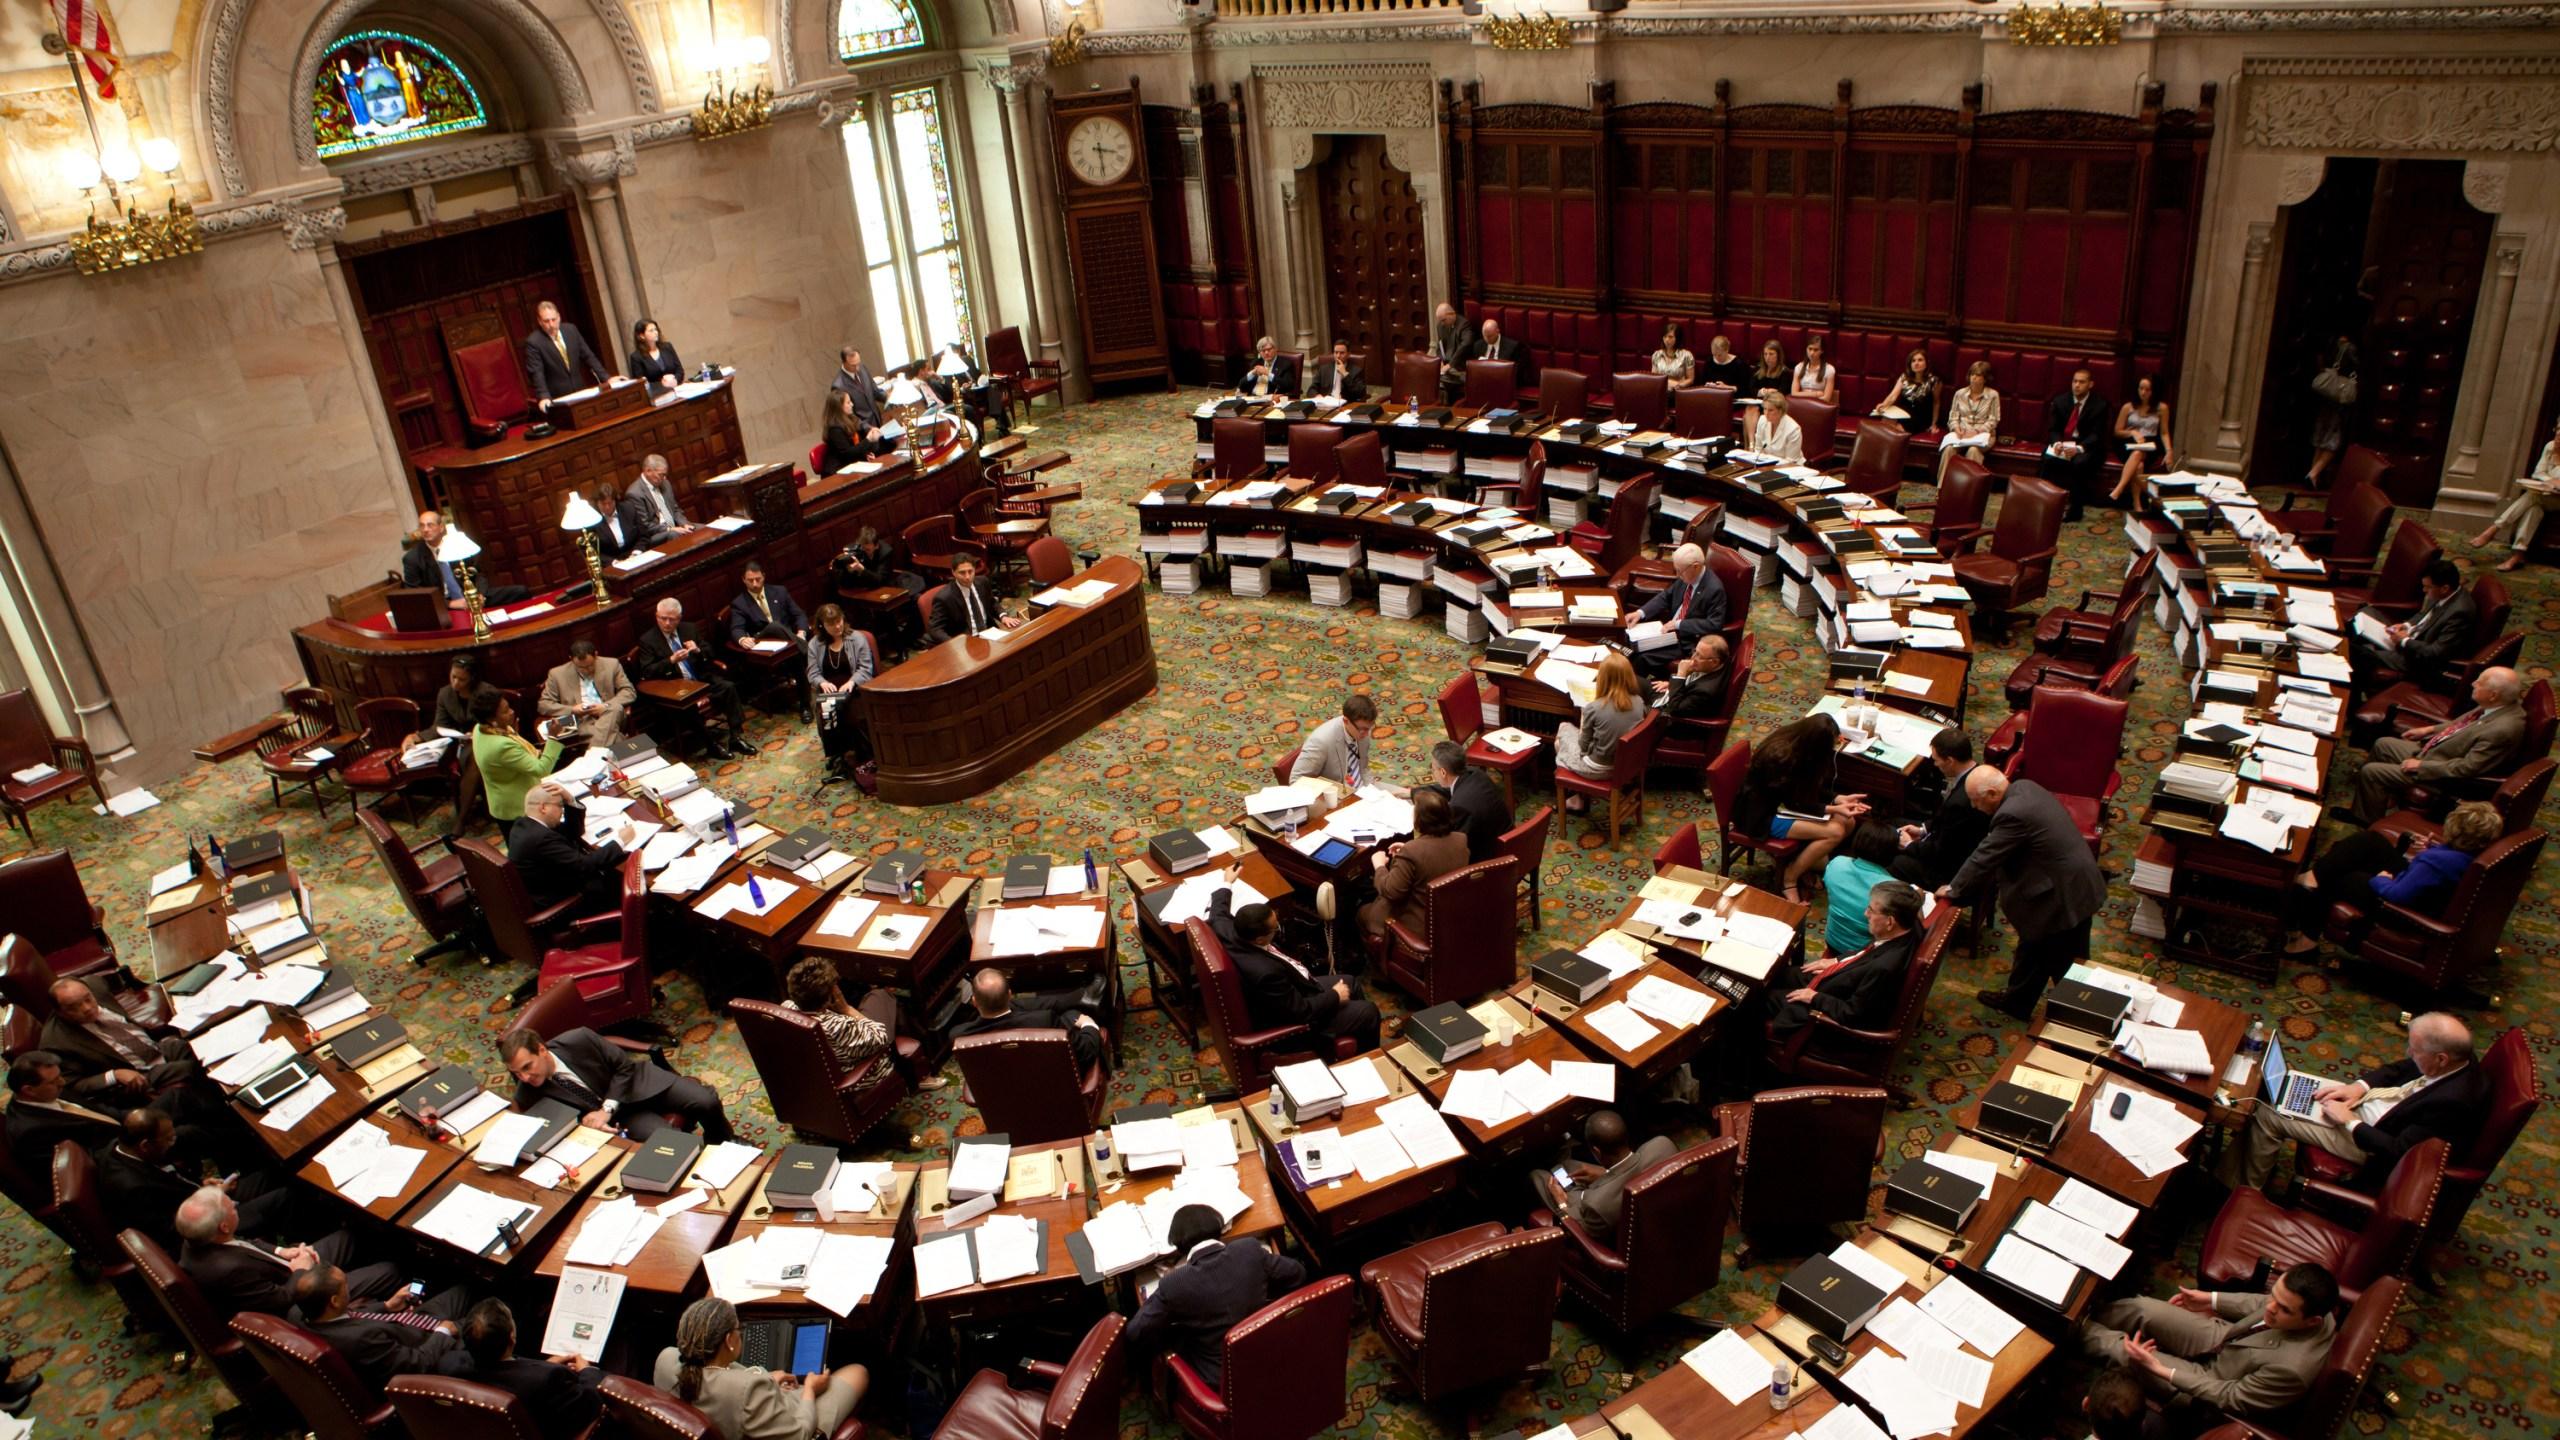 The New York State Senate debates legislation in the Senate chamber on June 16, 2011, in Albany, New York. (Credit: Matthew Cavanaugh/Getty Images)